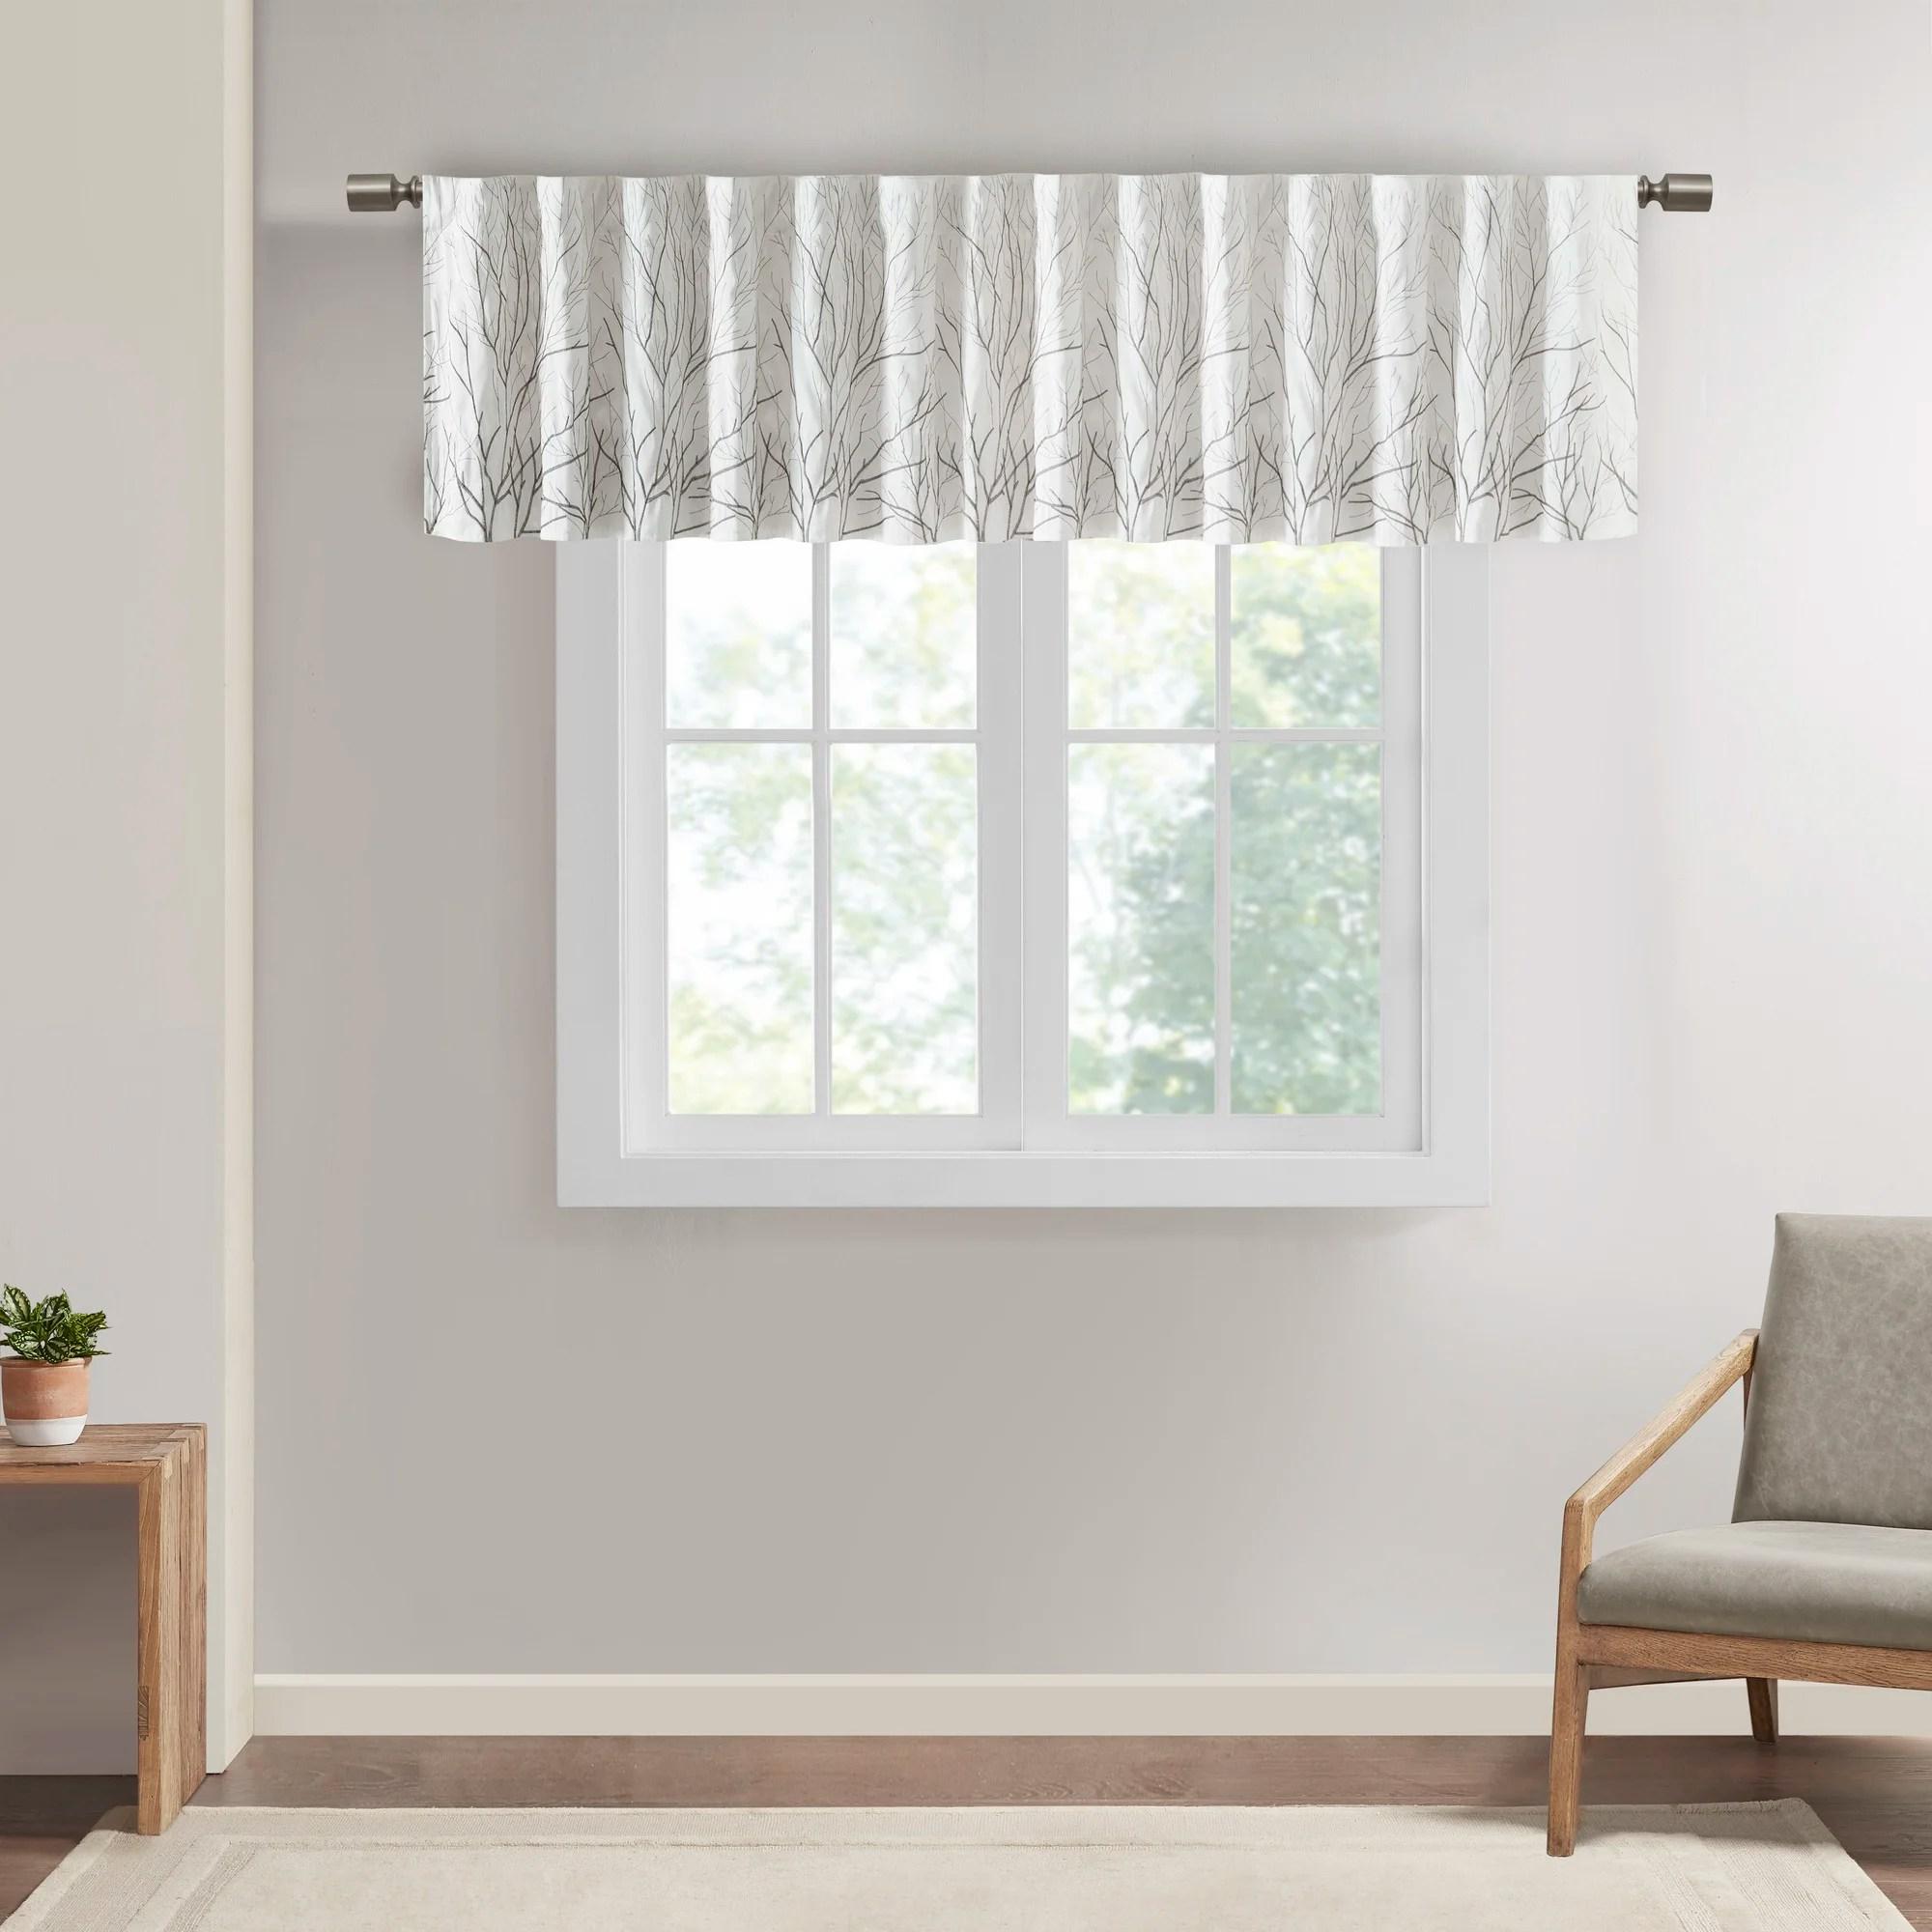 Window Valances Cafe Kitchen Curtains